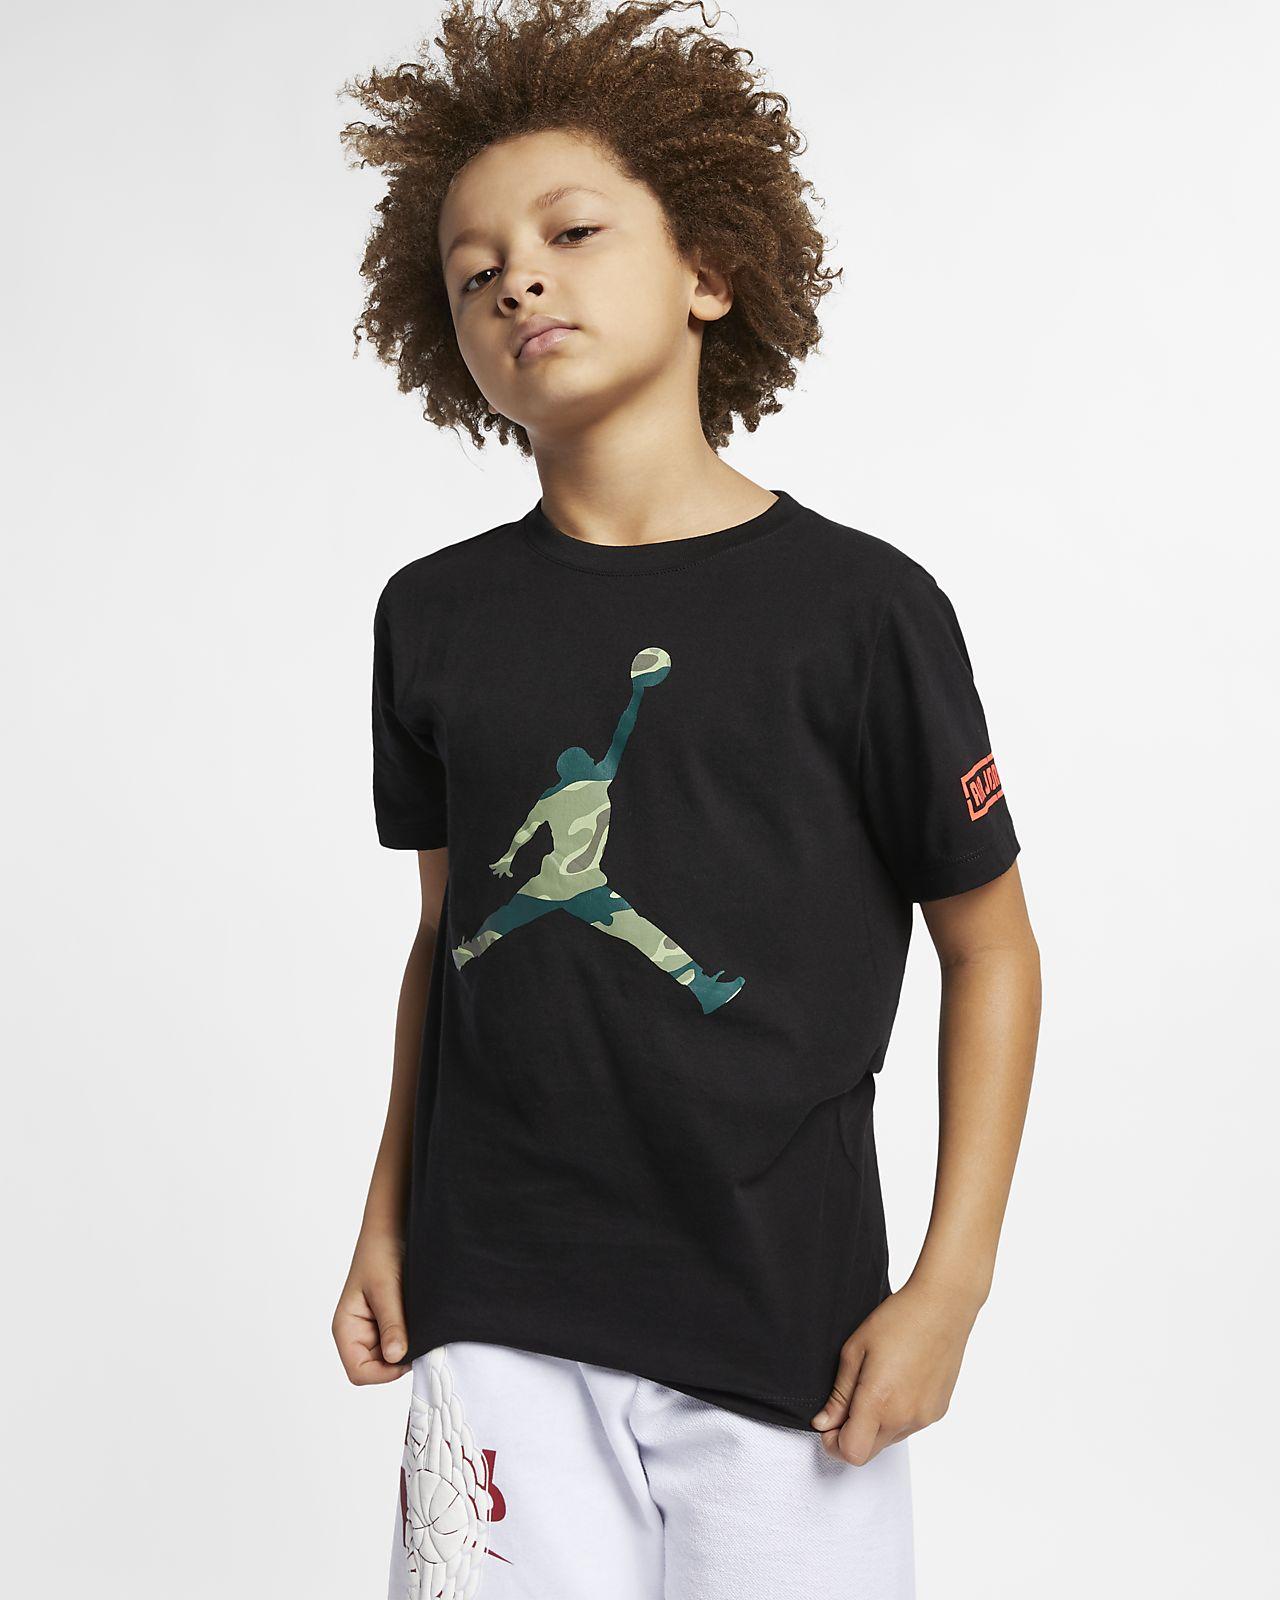 a0a74b51a606 Jordan City of Flight Older Kids  (Boys ) T-Shirt. Nike.com GB